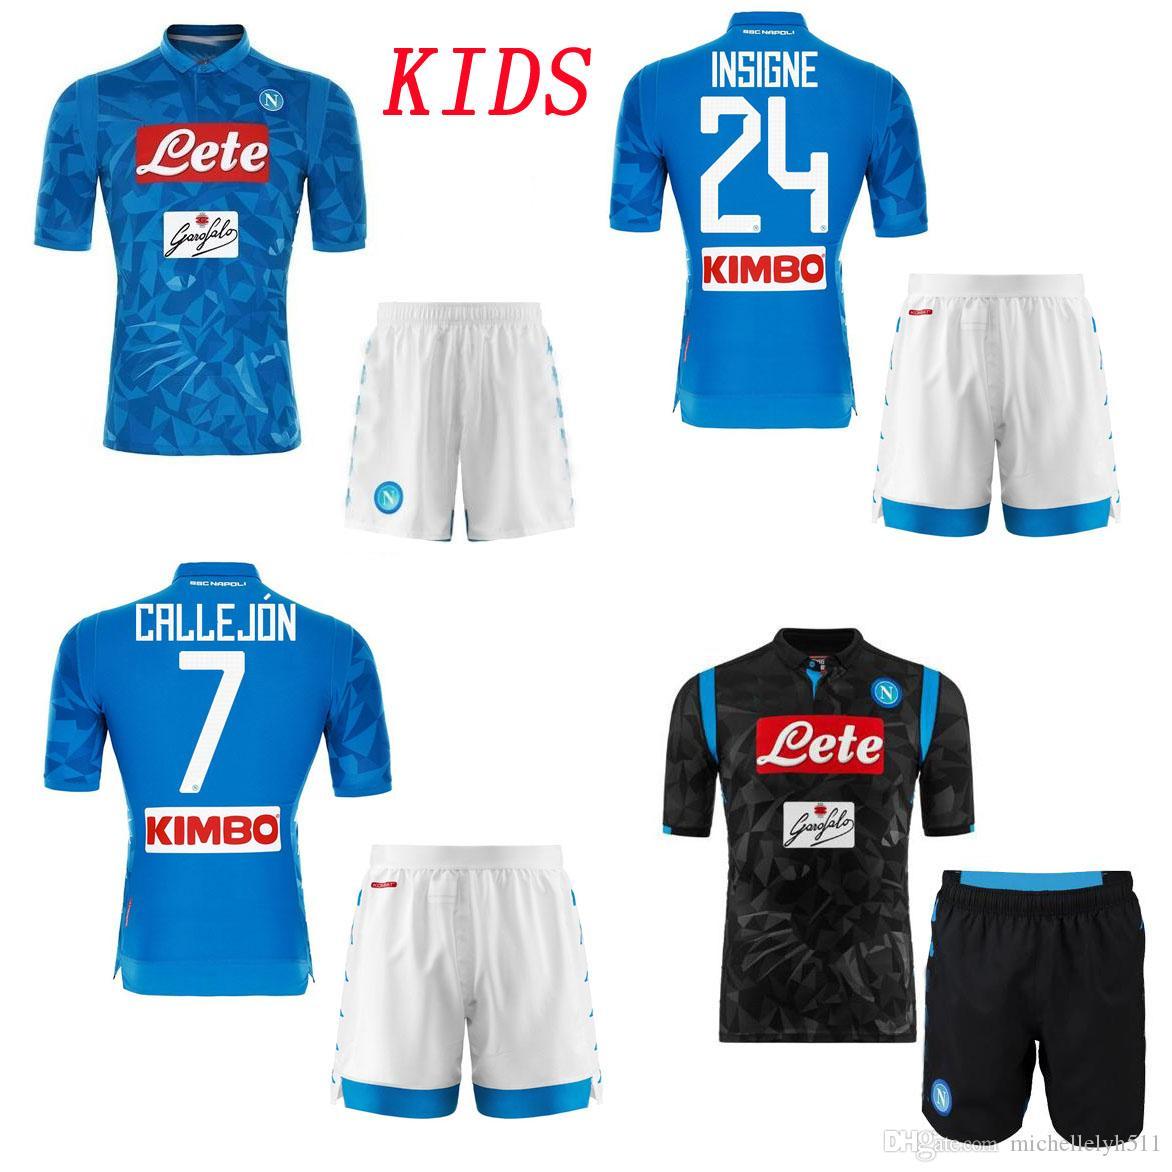 Compre 18 19 Kids Kit SSC Napoli Camisetas De Fútbol Shorts Nápoles INSIGNE  HAMSIK Zielinski GABBIADINI MERTENS Conjuntos De Fútbol Niños Uniformes ... 998ceff2b34c0